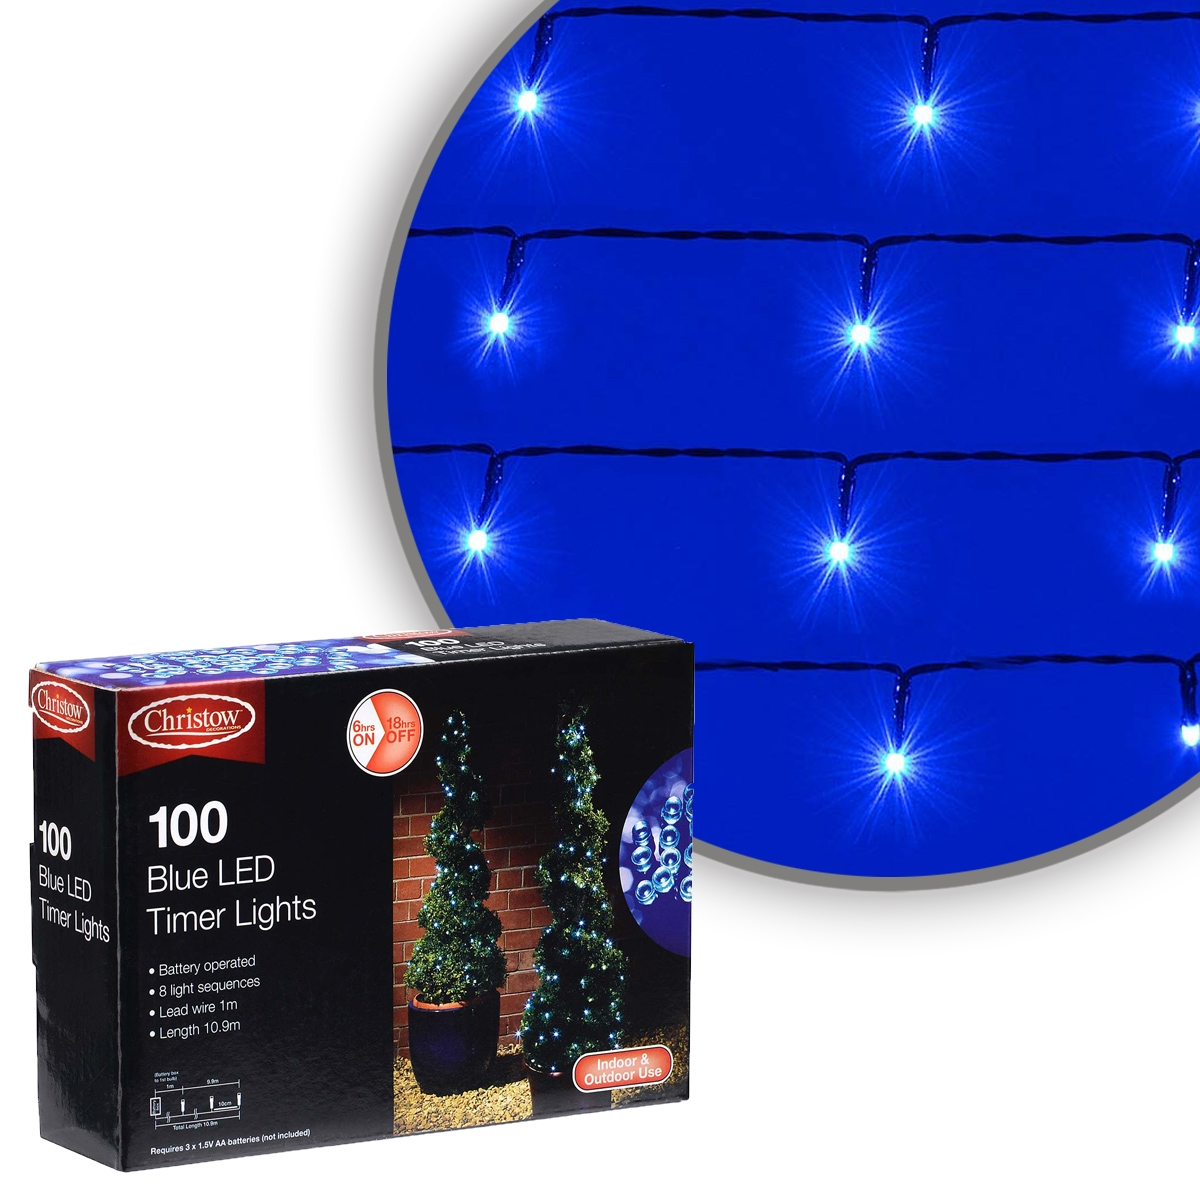 Image of Blue 100 LED Battery Multi-Function Christmas Timer Lights